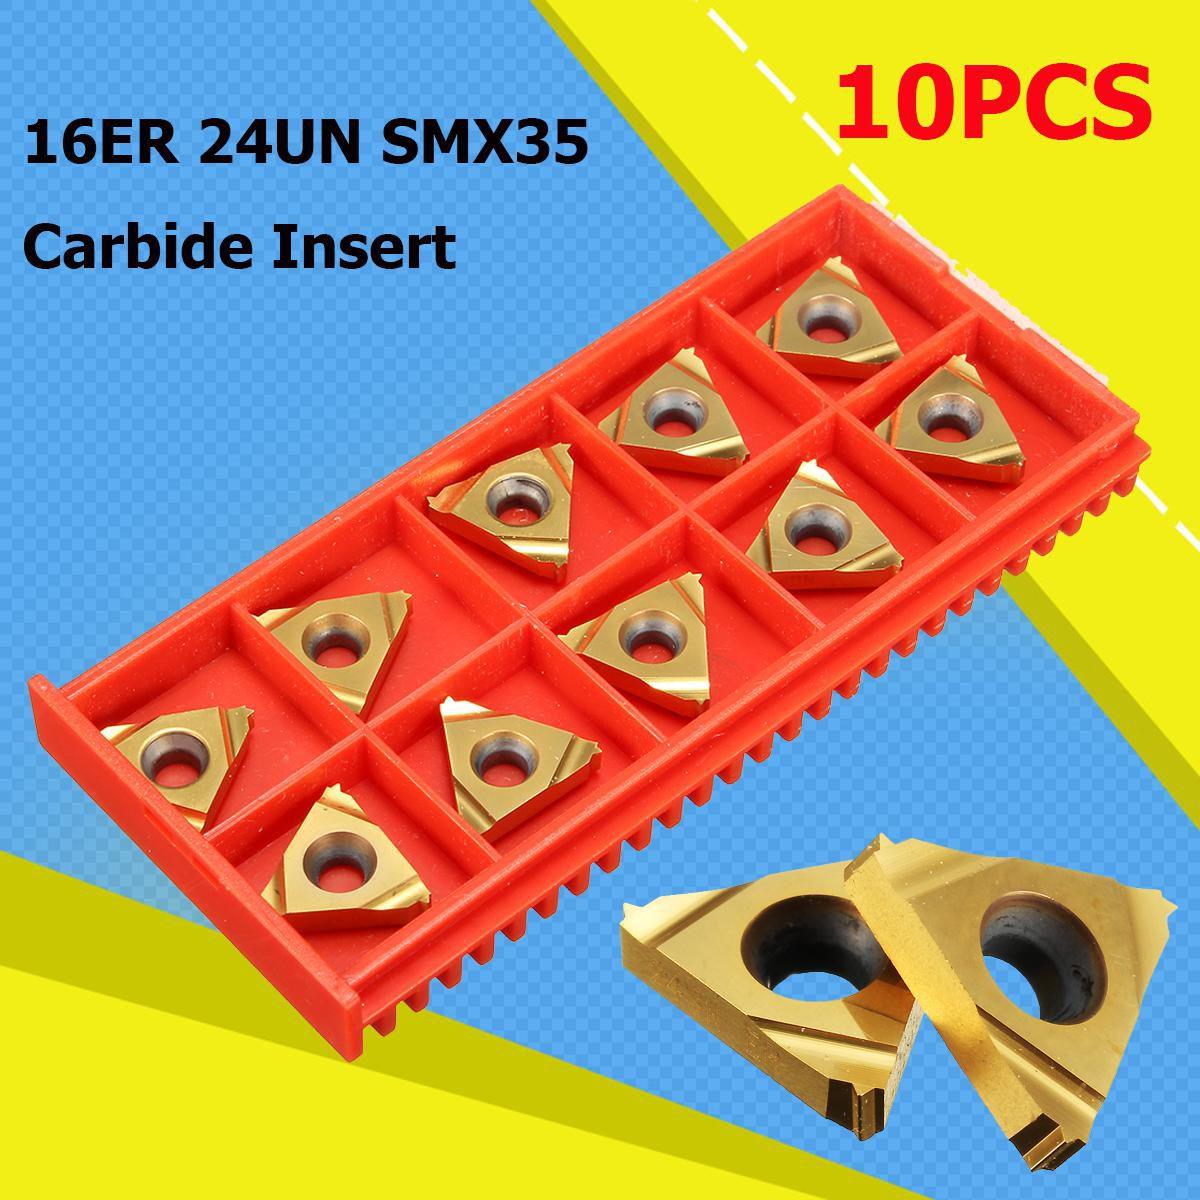 10pcs 16ER 24UN SMX35 Carbide Insert Blade Lathe Threading Boring Blad CNC